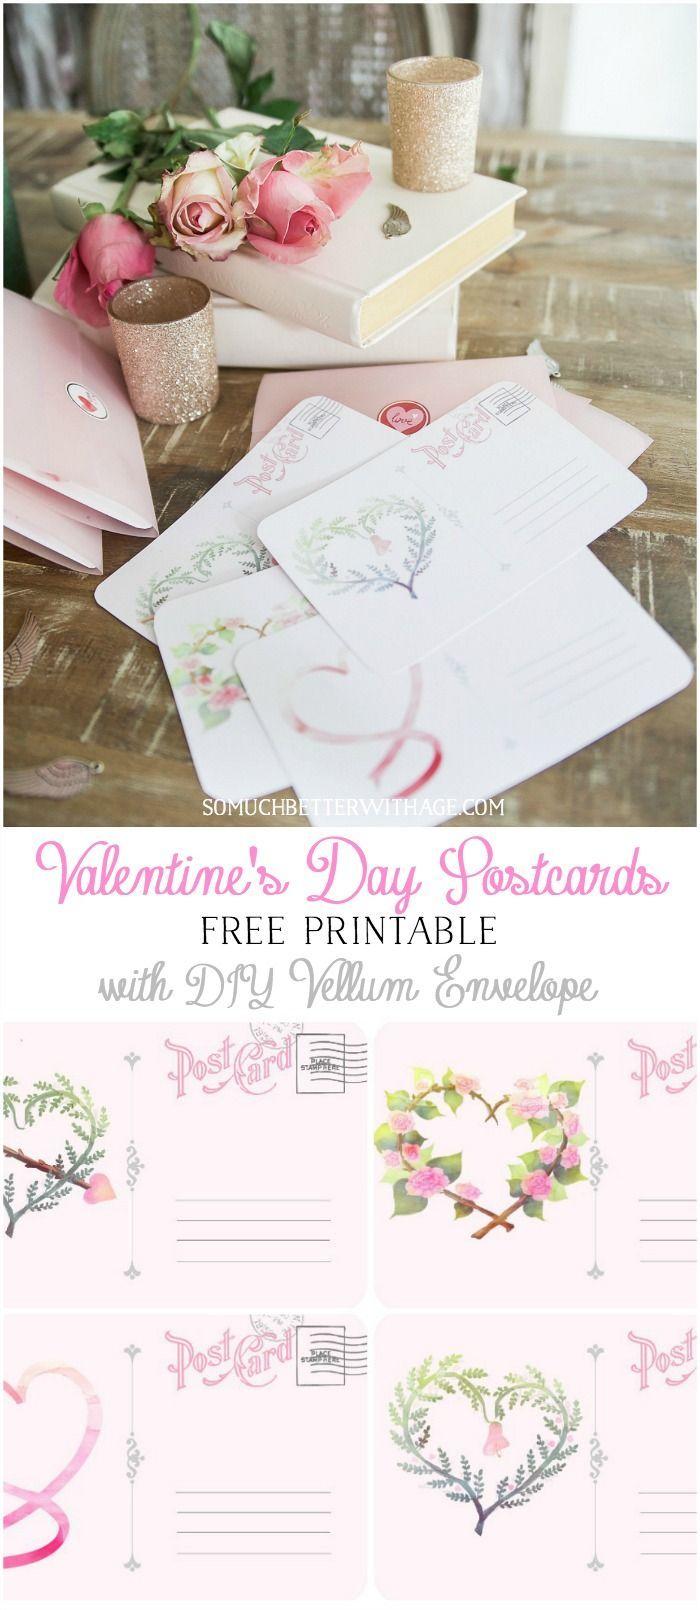 Valentine's Day Free Postcard Printables/Download with DIY Vellum Envelope